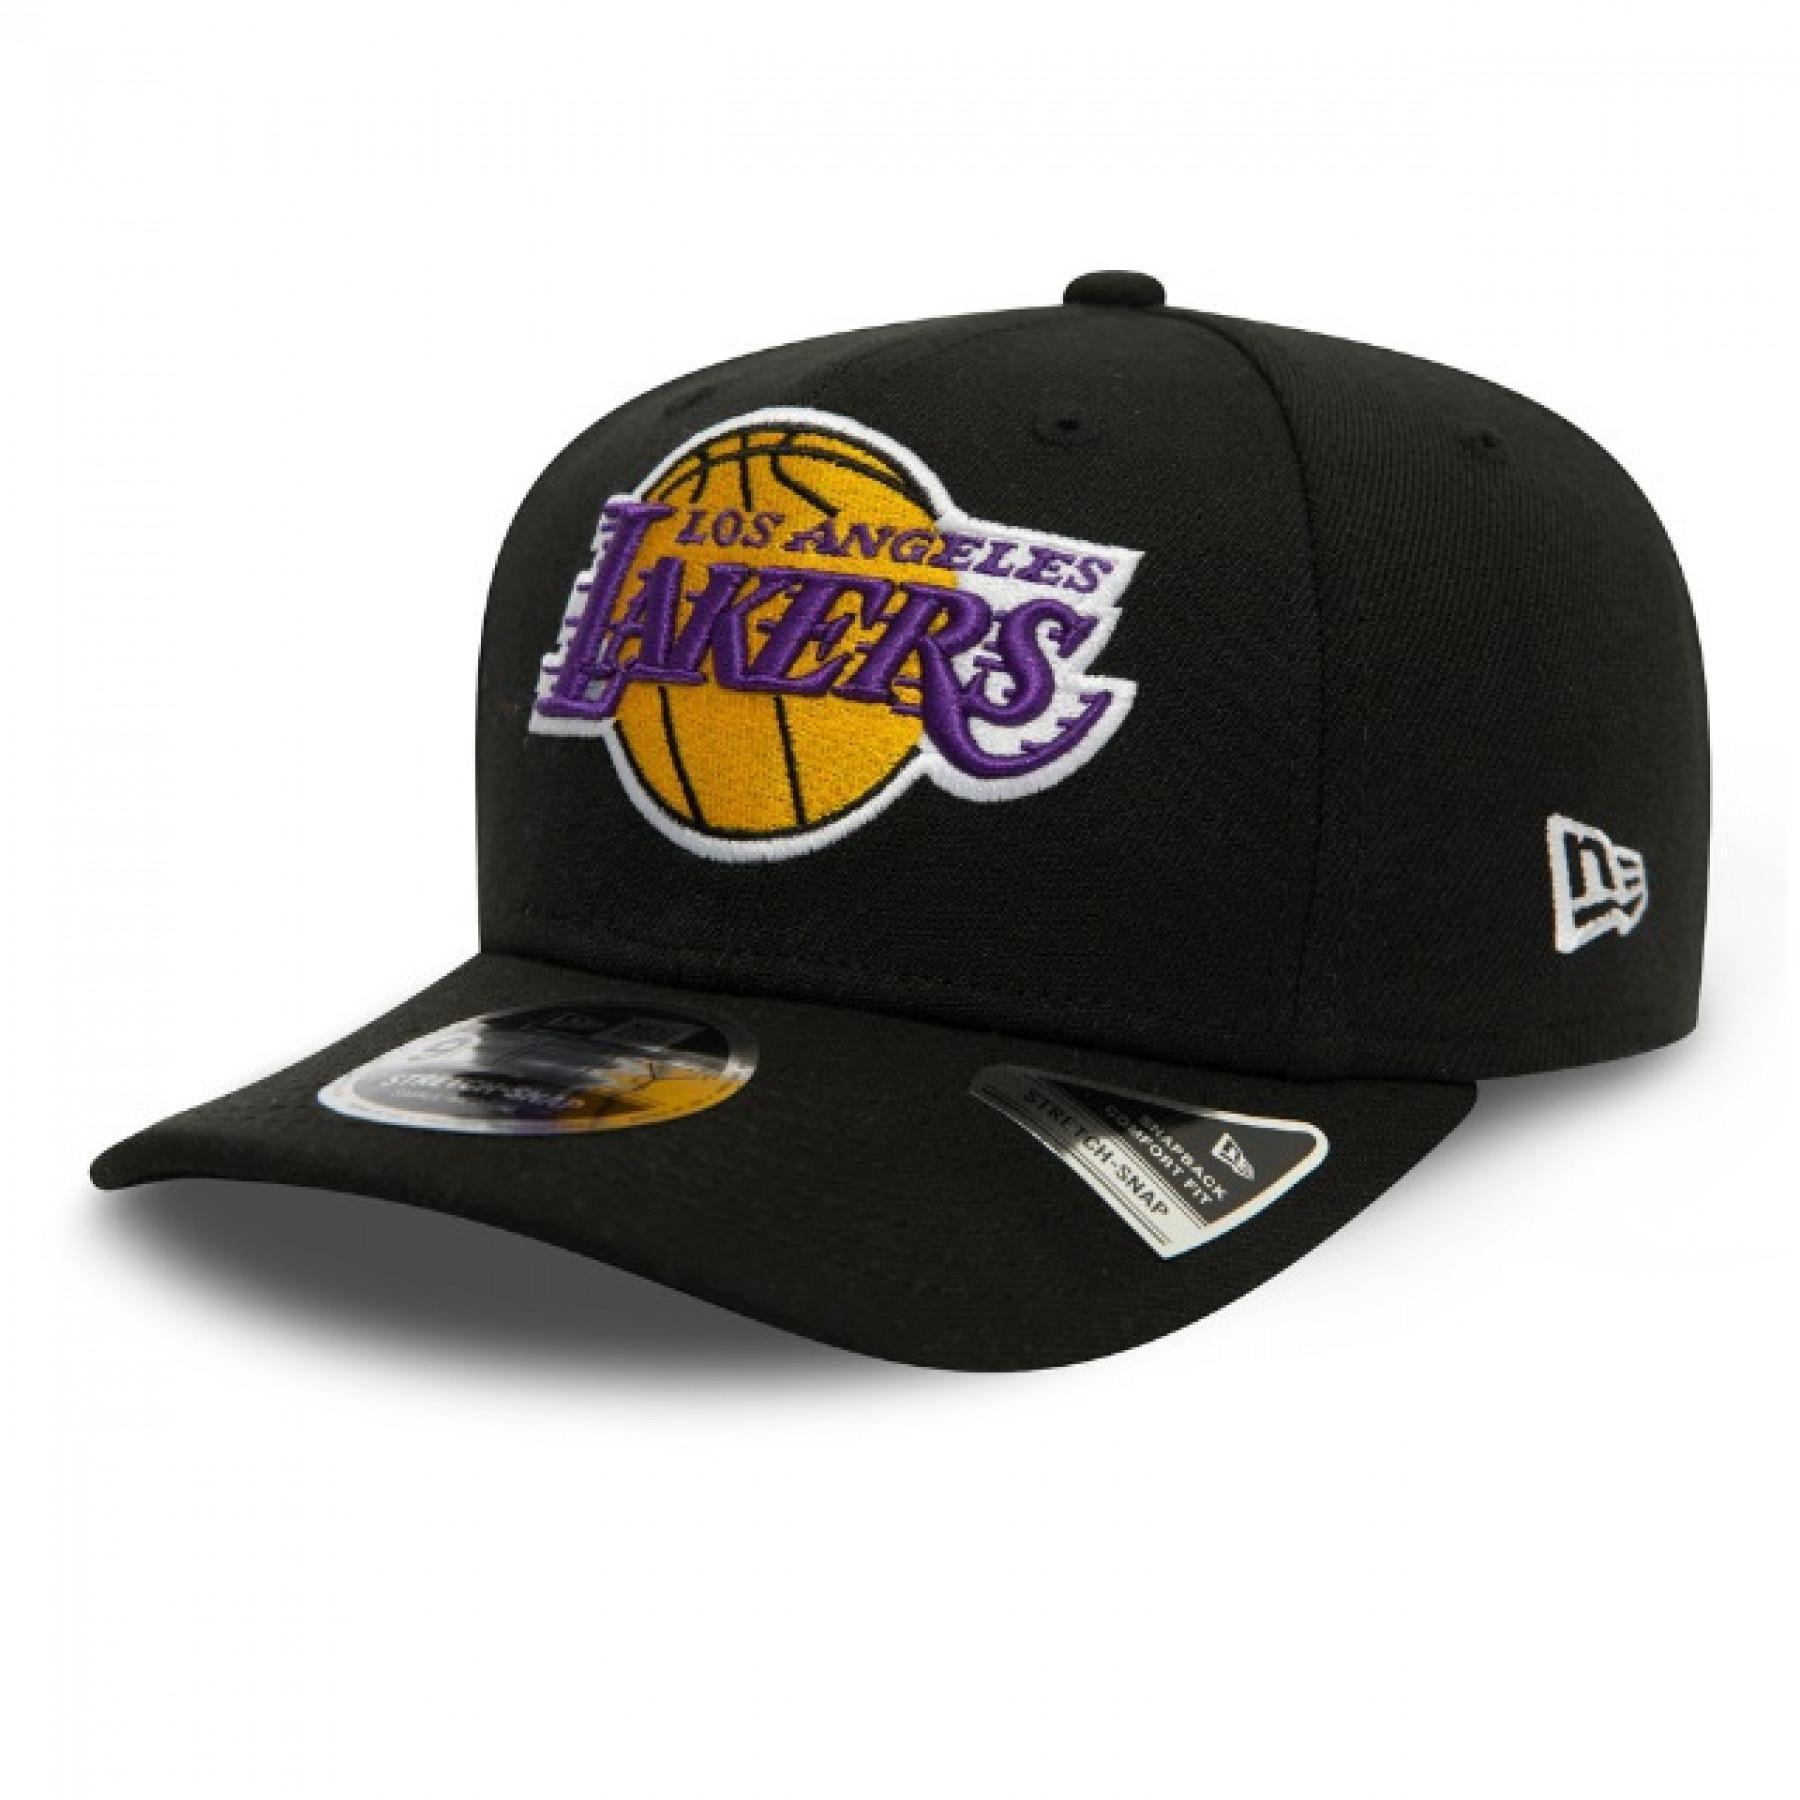 New Era Lakers Stretch 9fifty Cap